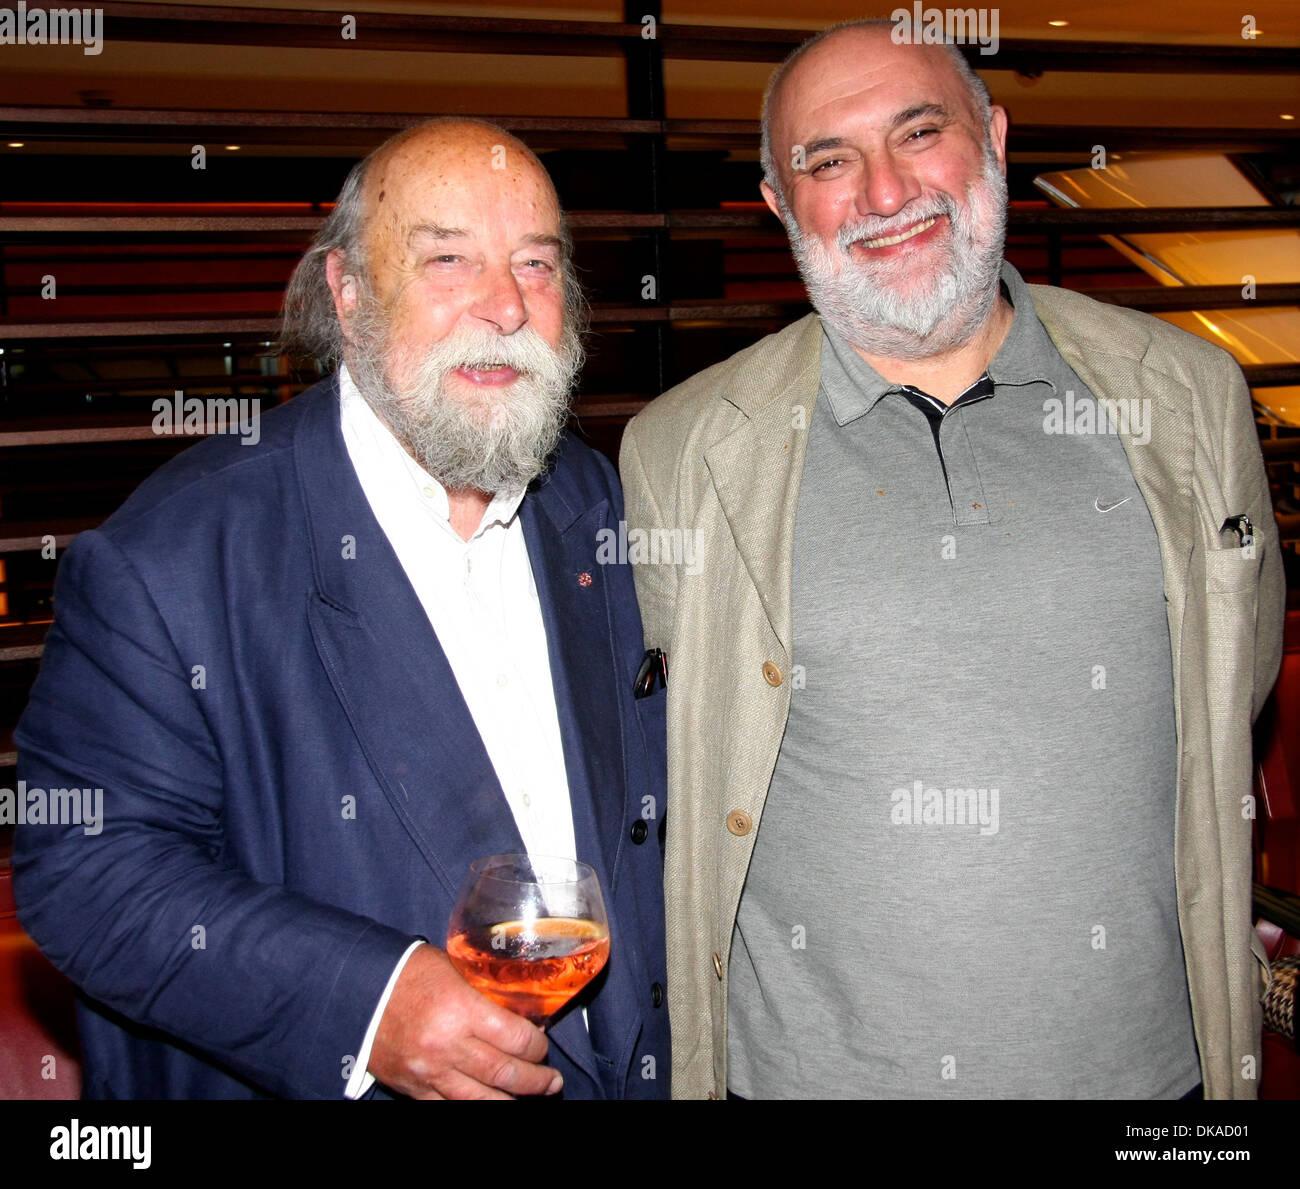 Roy Ackerman and Alexei Sayle Liverpool Love Art exhibition London, England - 21.09.12 - Stock Image